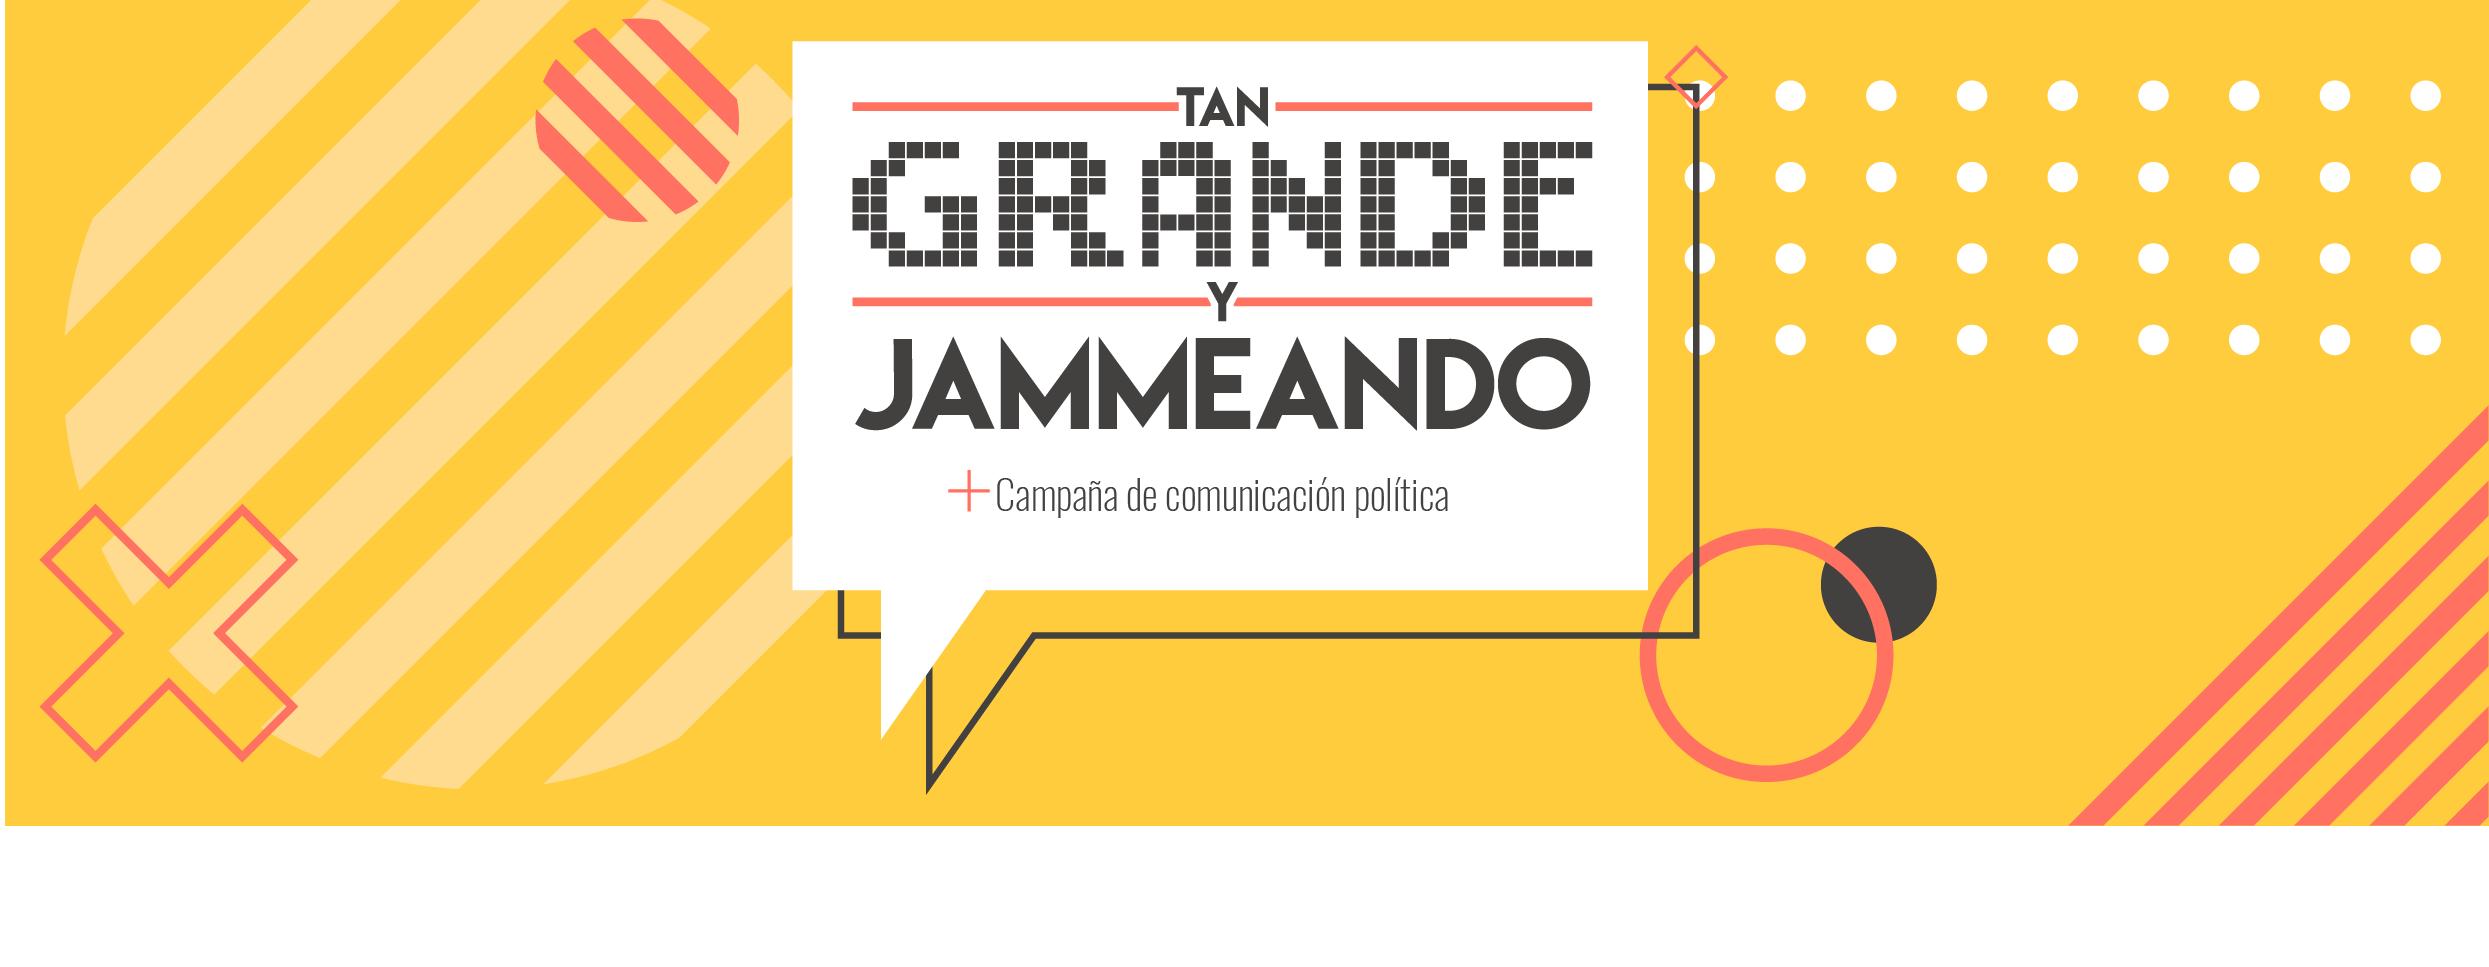 Social Jam, Jam social, Tan Grande y Jameando